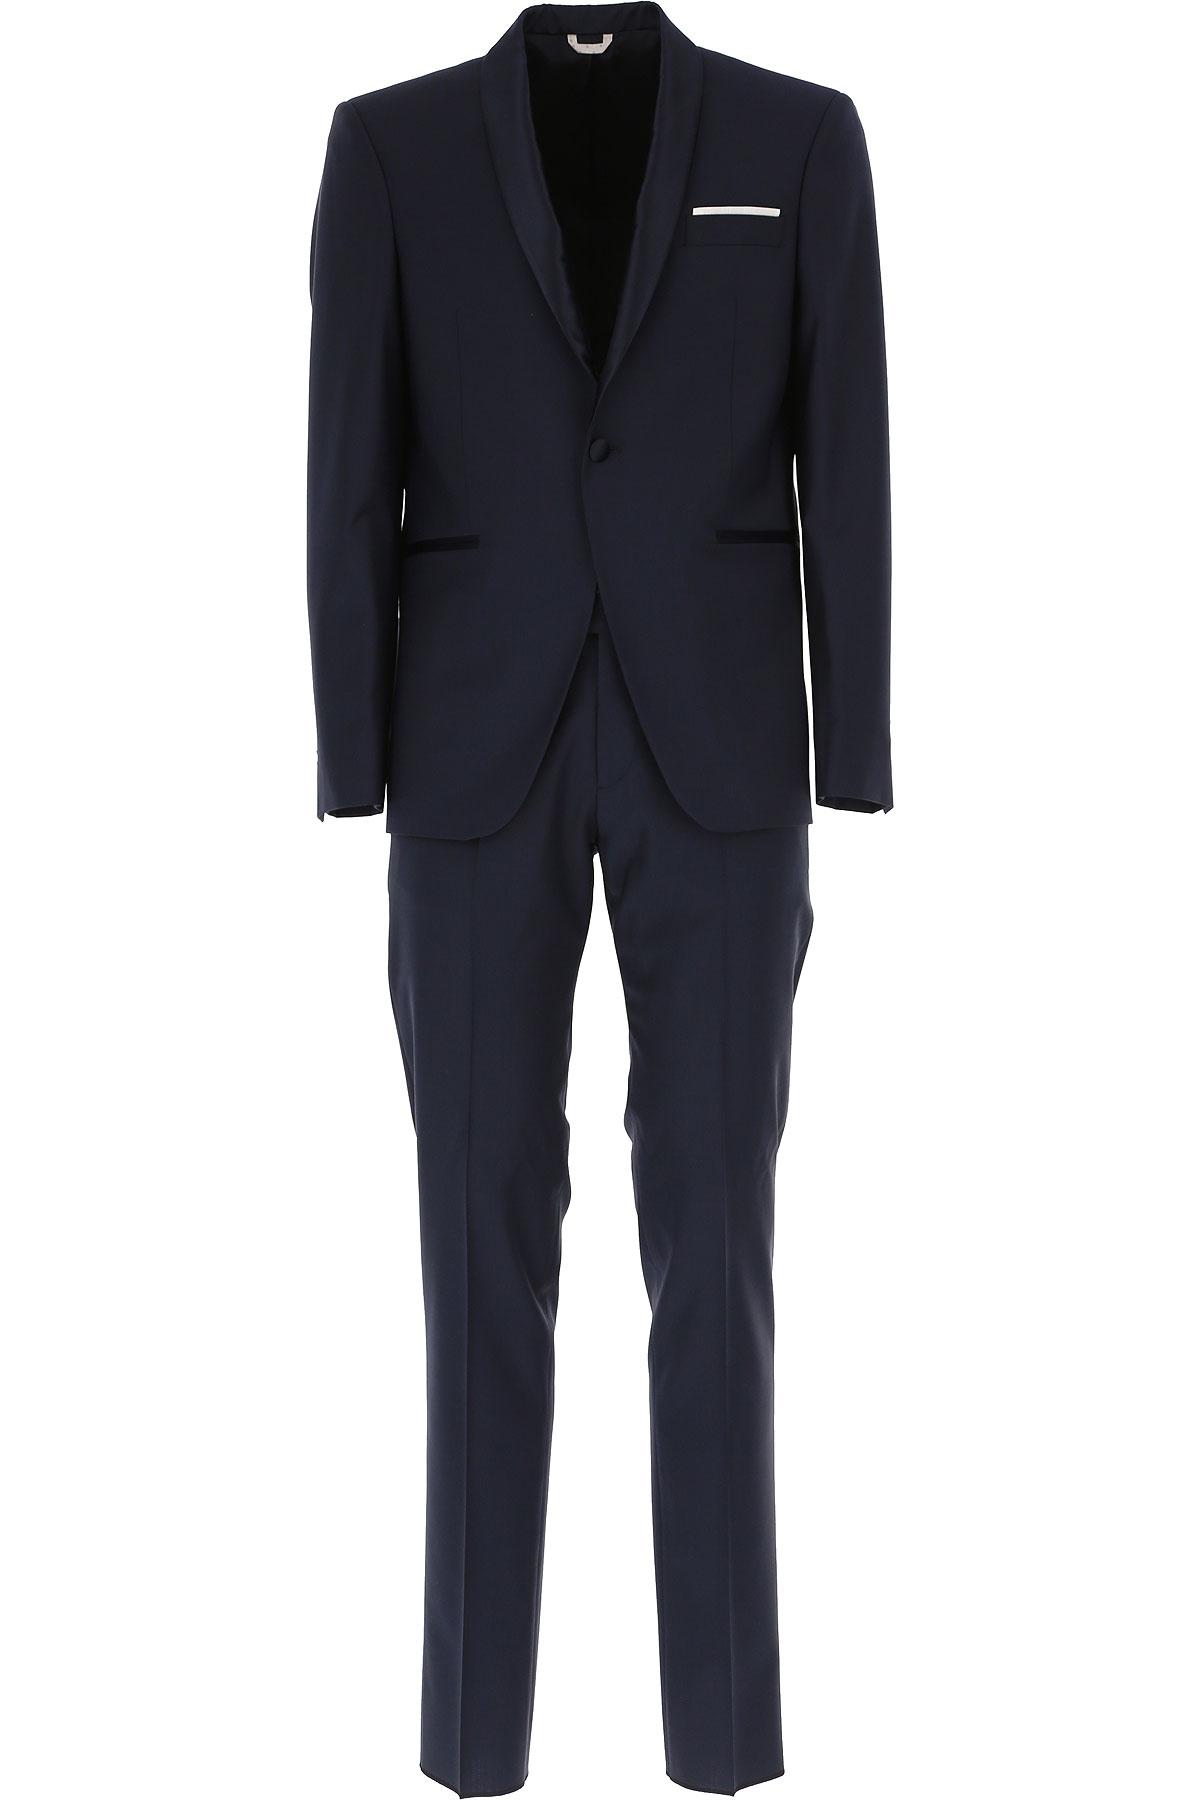 Simbols Men's Suit, Dark Blue, polyester, 2019, L XL